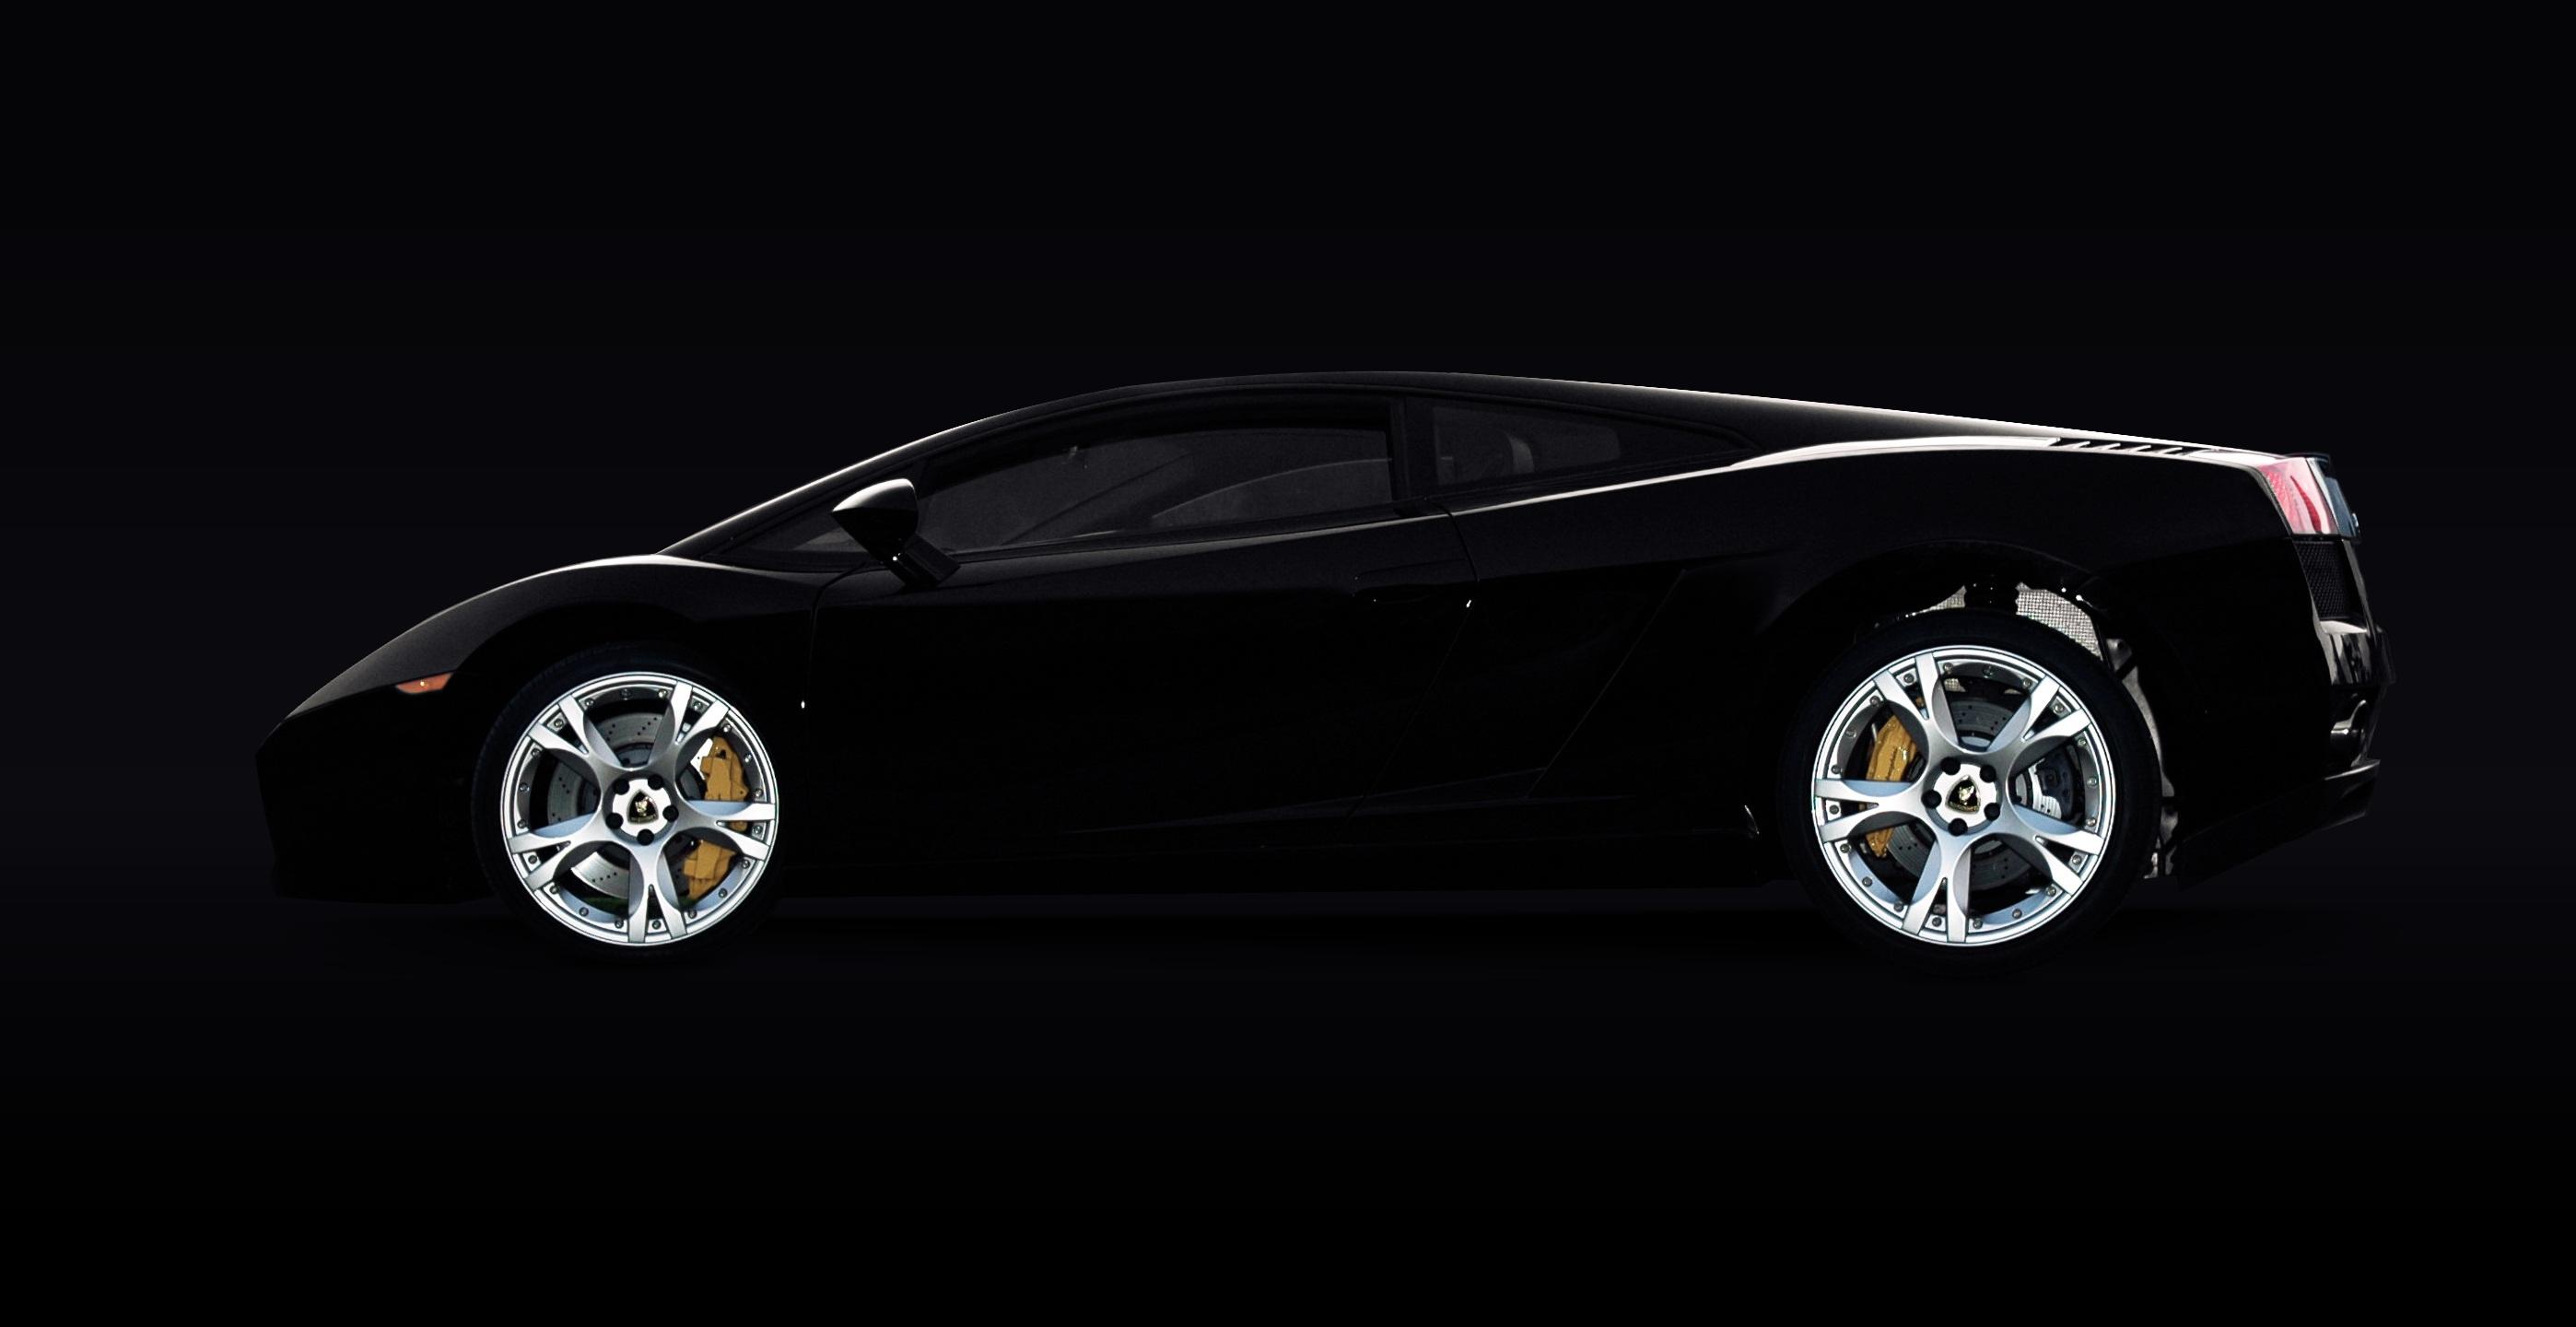 Matte Black Luxury Car Wallpaper Black Lamborghini Murcielago 183 Free Stock Photo